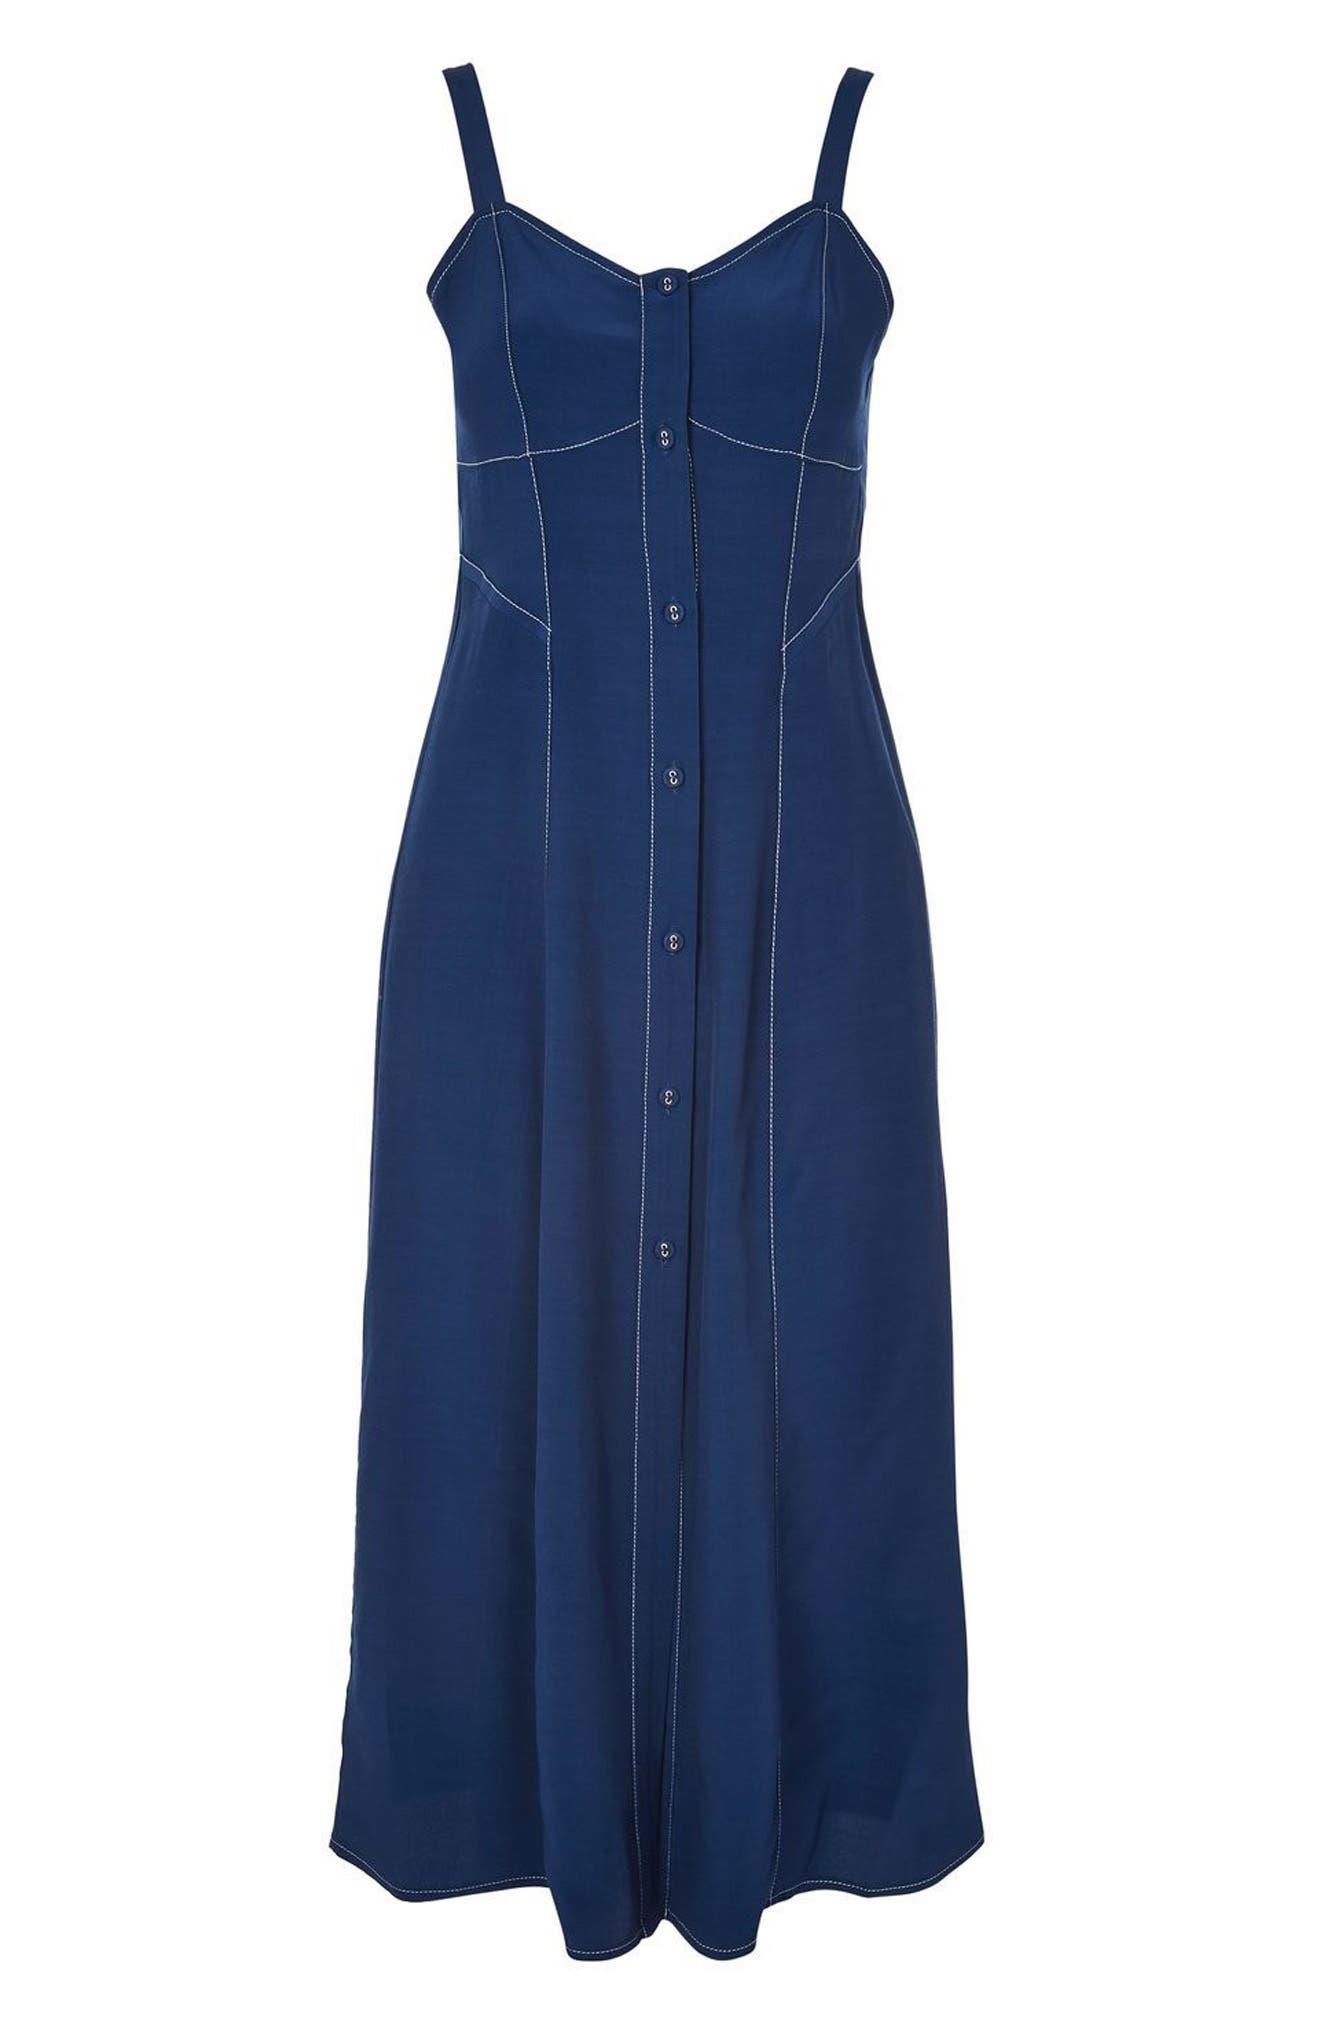 Topstitch Corset Midi Dress,                             Alternate thumbnail 3, color,                             410